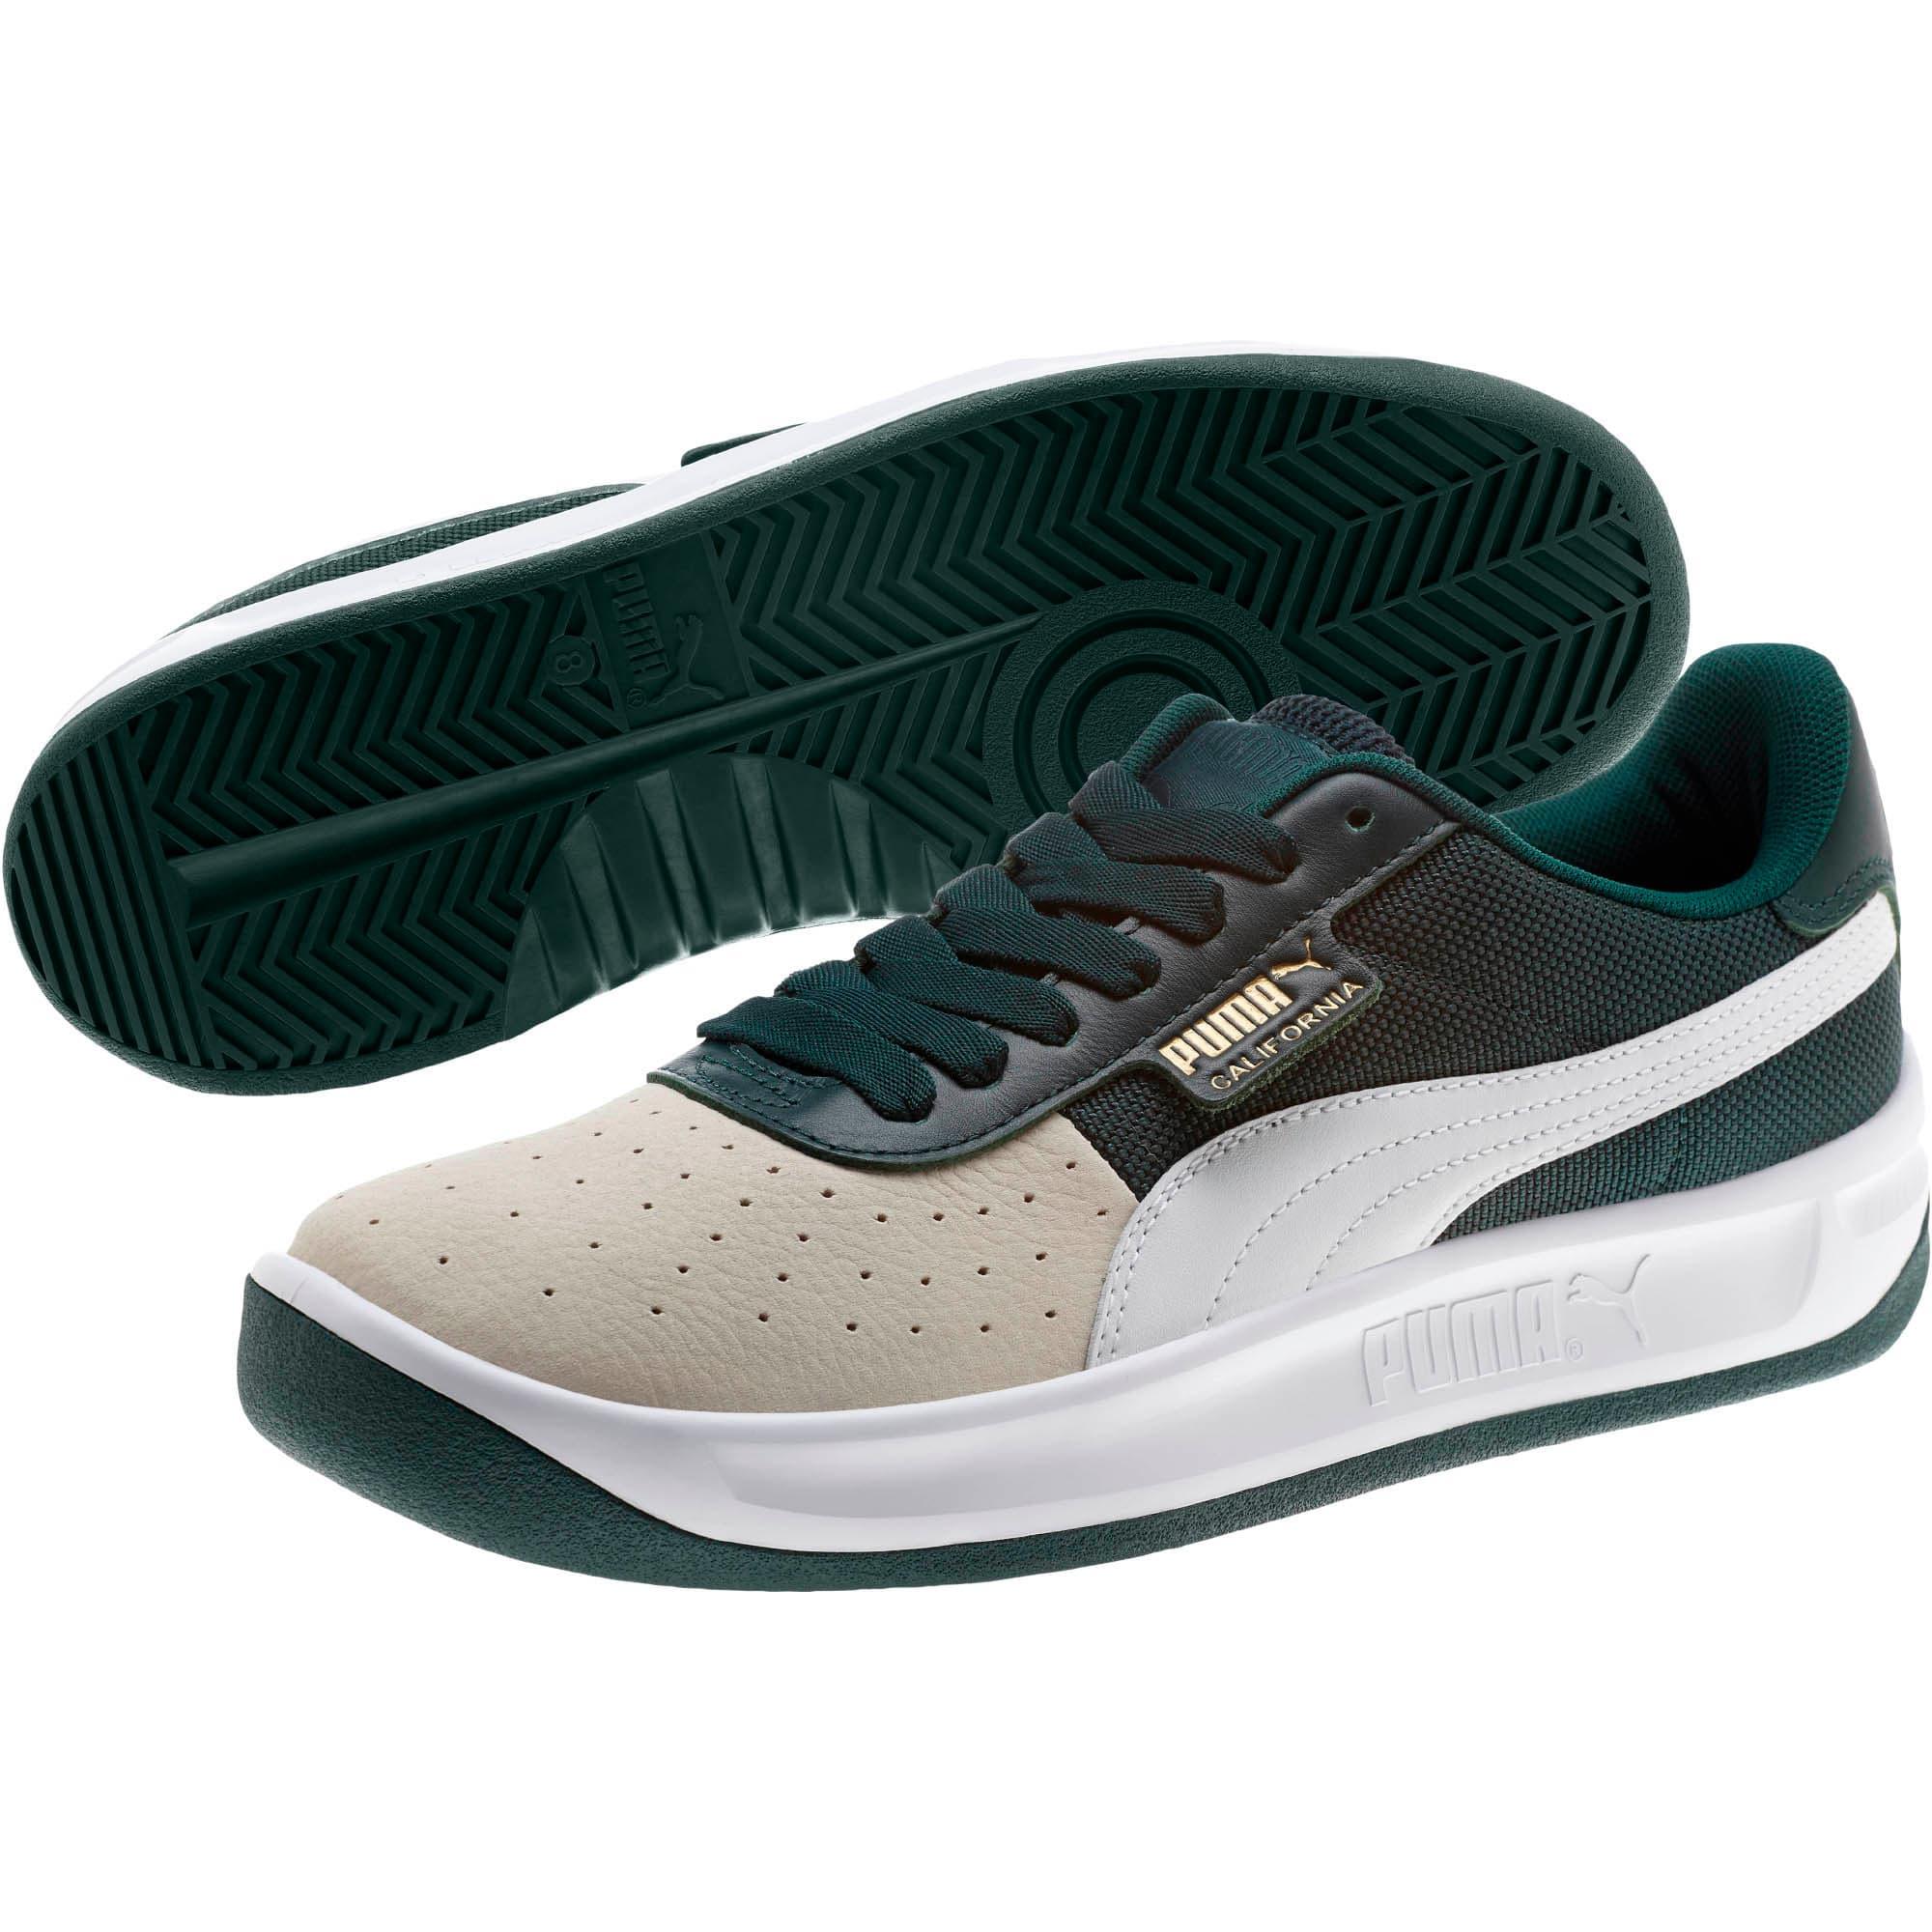 Thumbnail 2 of California Sneakers, WhsprWht-PonderosaPin-PumWht, medium